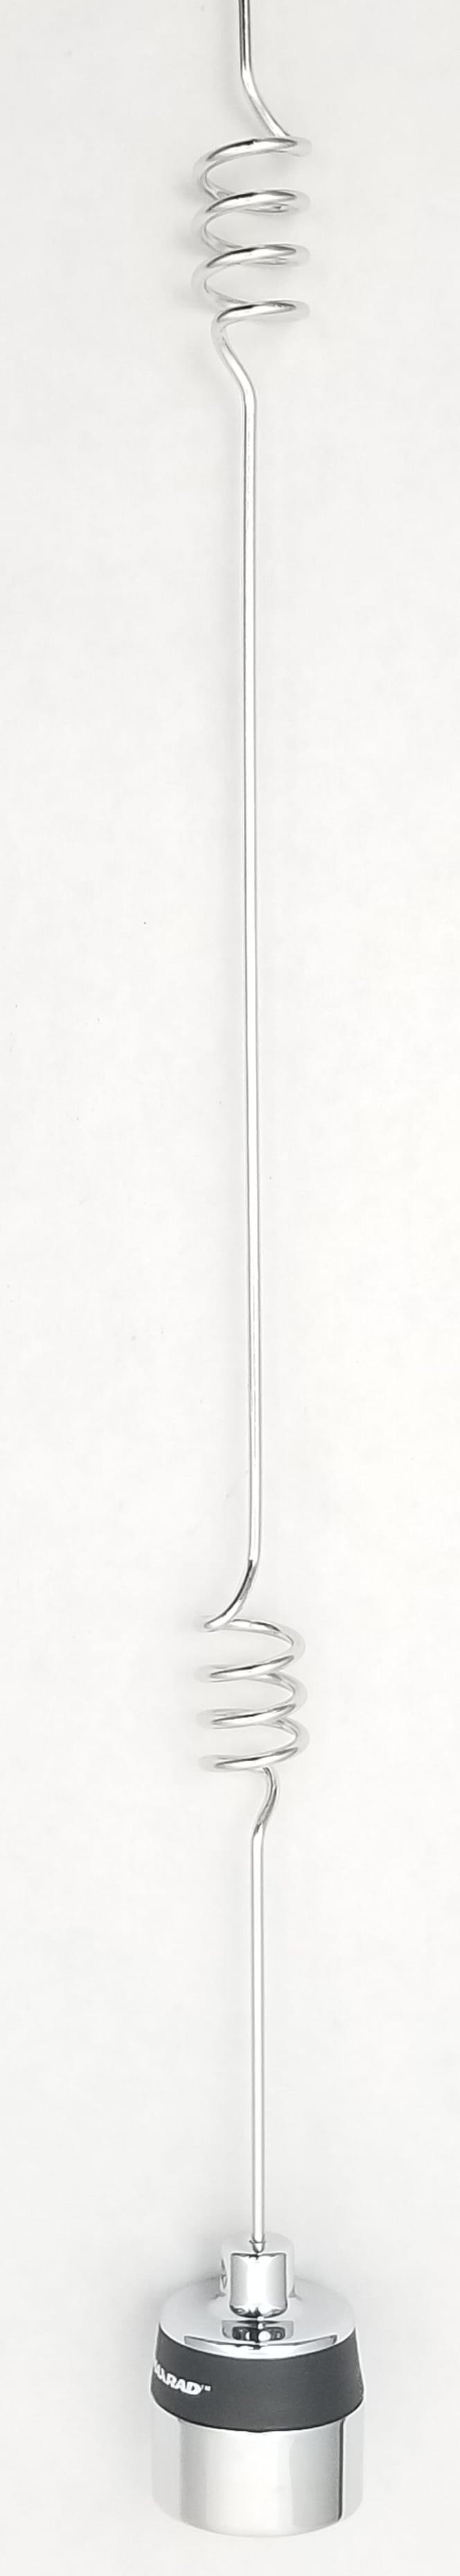 MUF8105 - Maxrad 806-866Mhz 5Db Open Coil Antenna